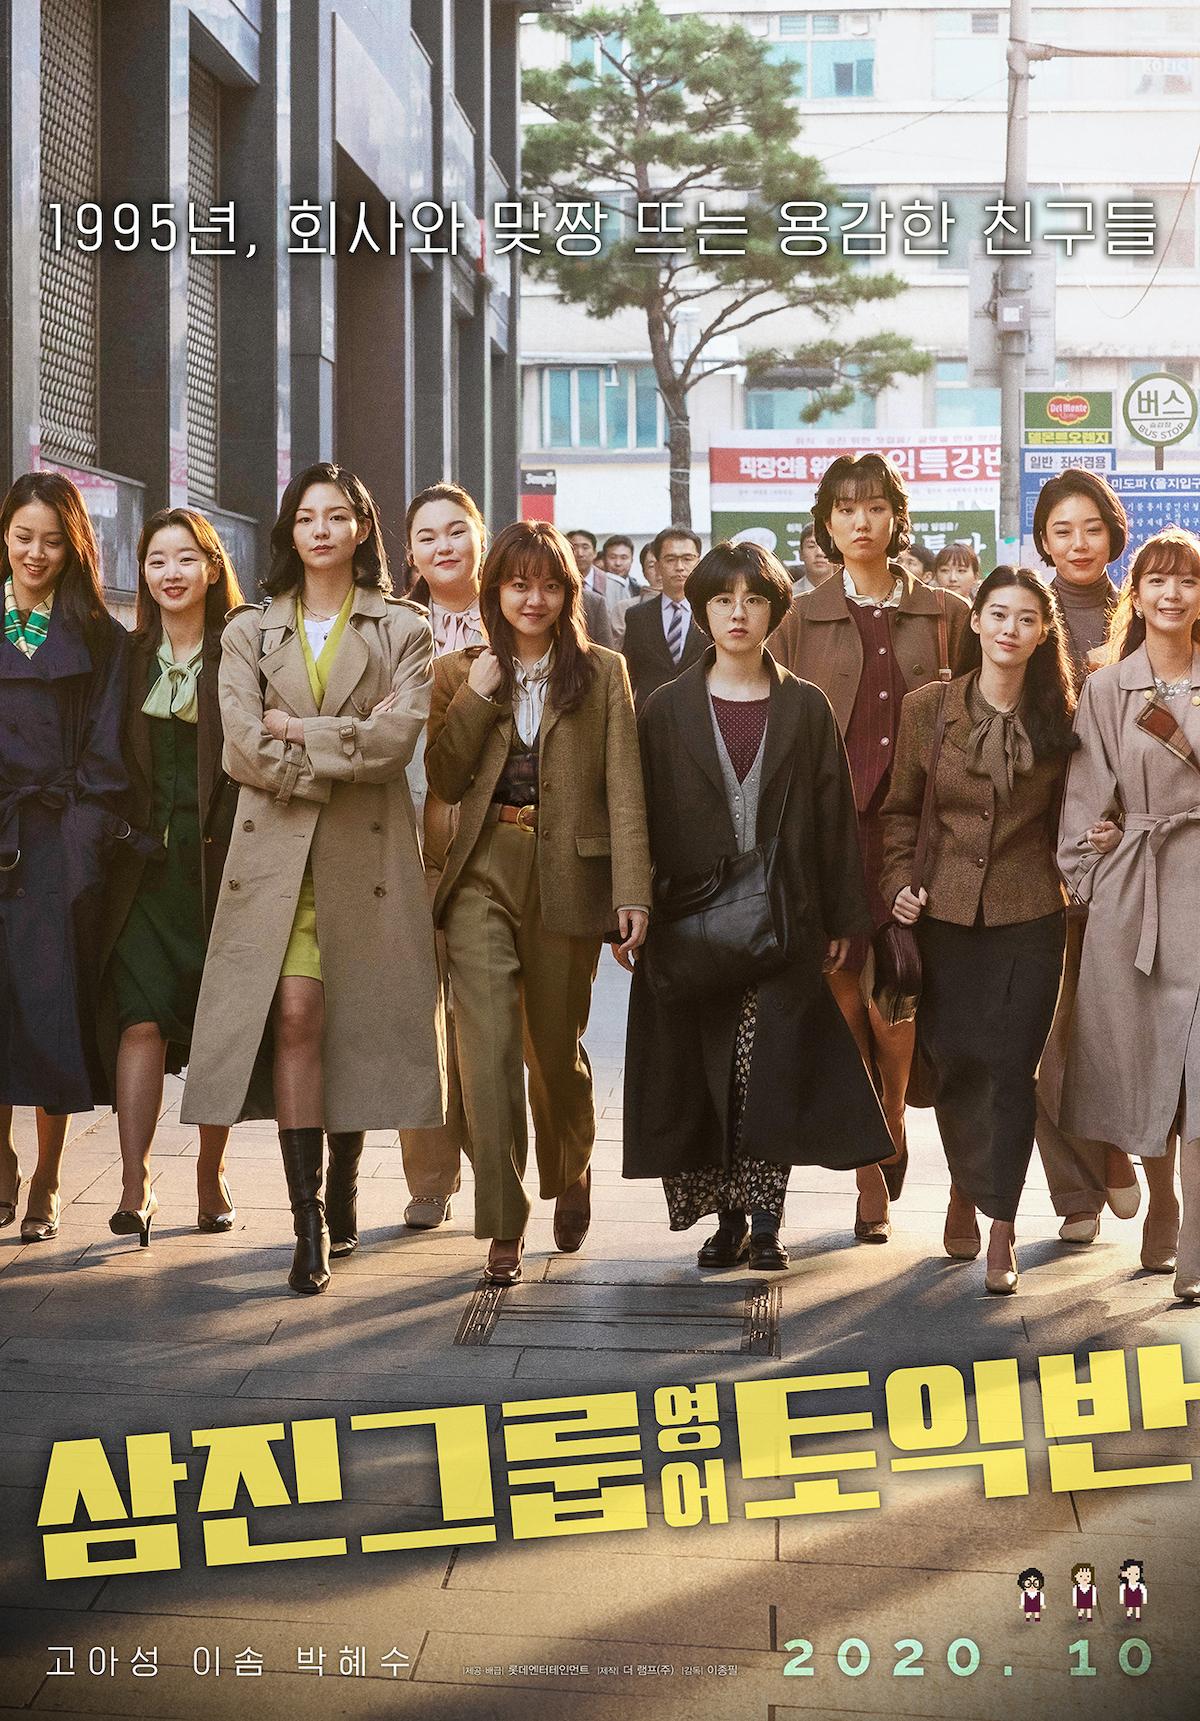 Samjin Group Yeong-aw TOEIC-ban [บรรยายไทย]